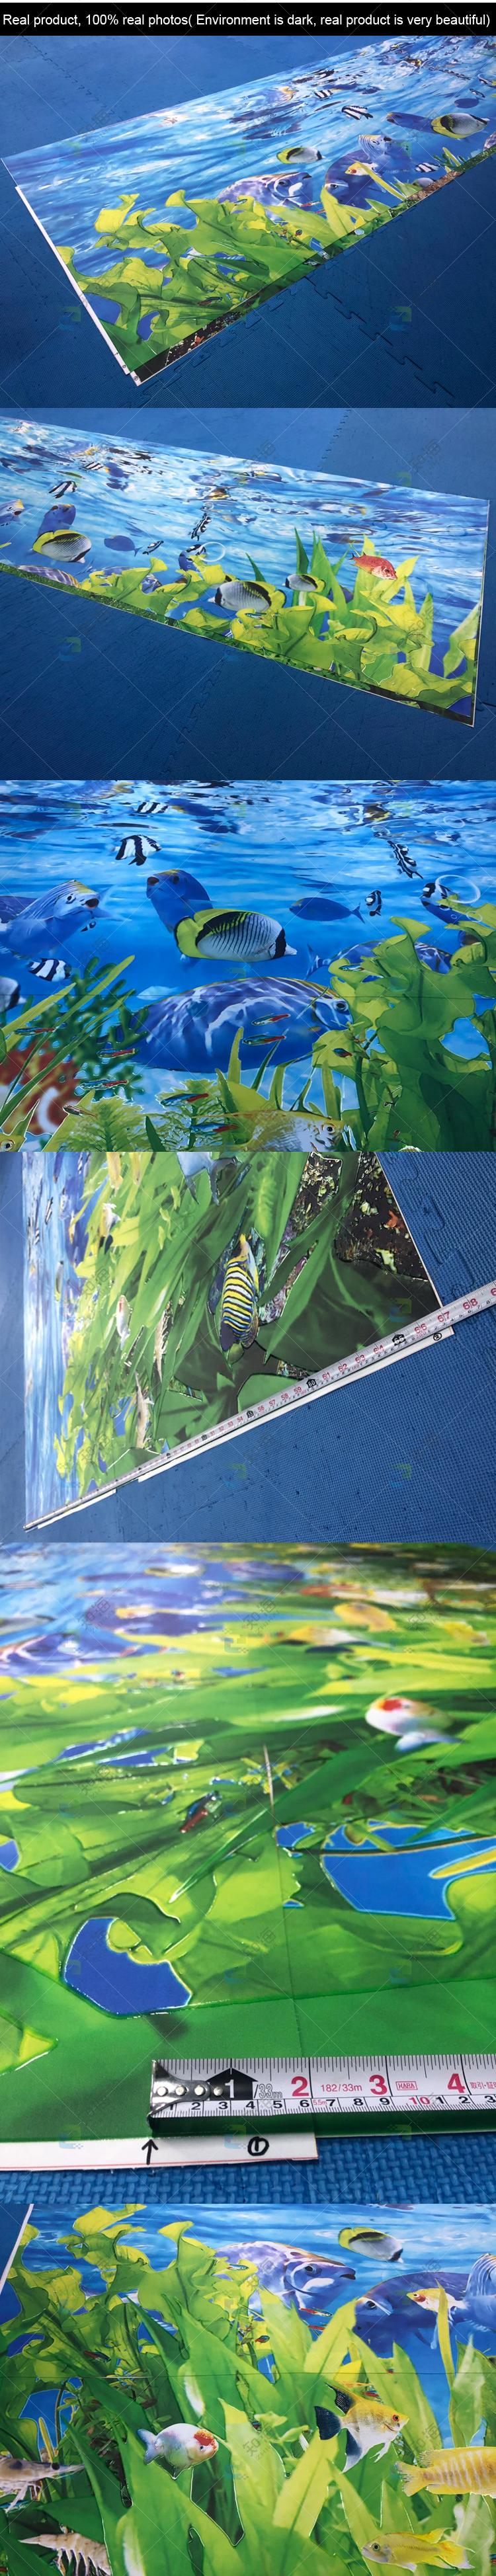 senior clubs hotel decoration diamond uv print flowers pop wall design in hall